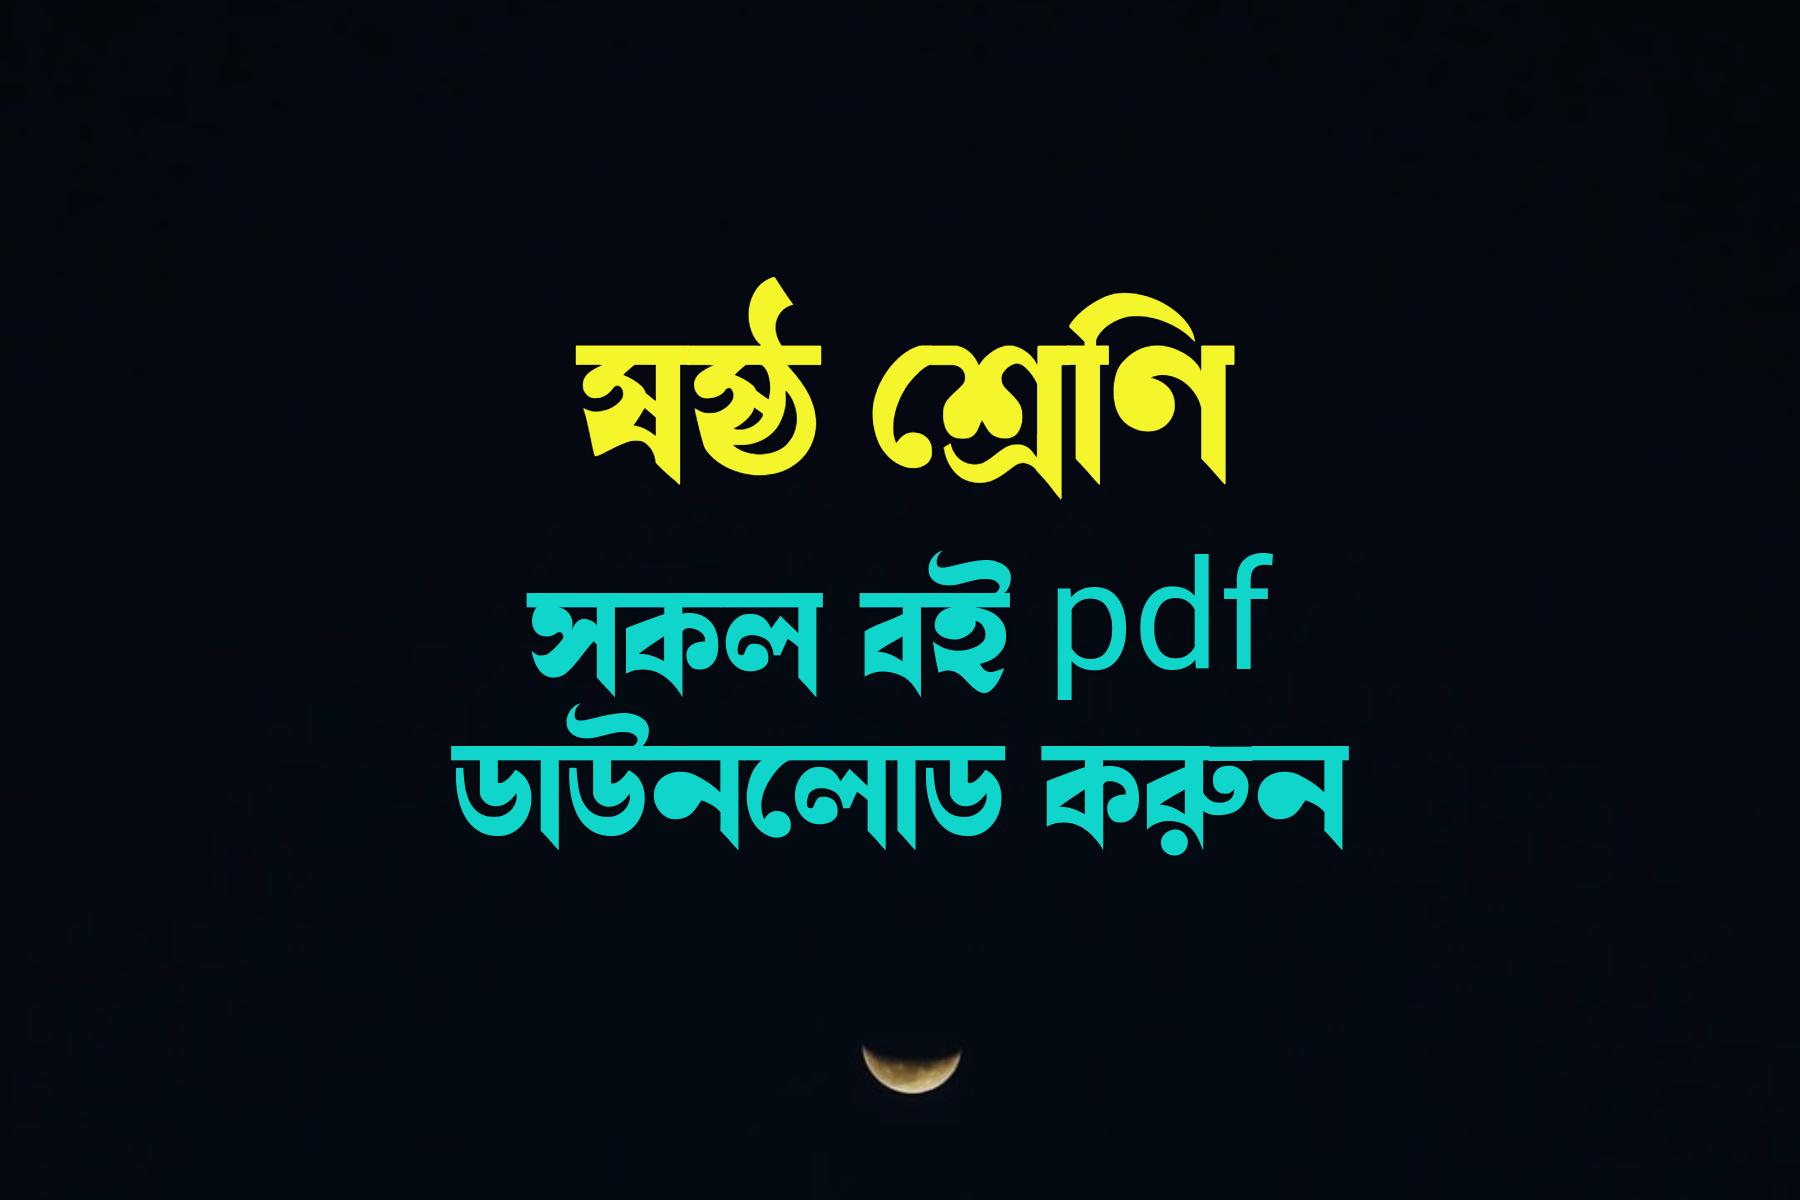 Class Six All Book PDF Download   ষষ্ঠ শ্রেণীর সকল বই pdf download করুন